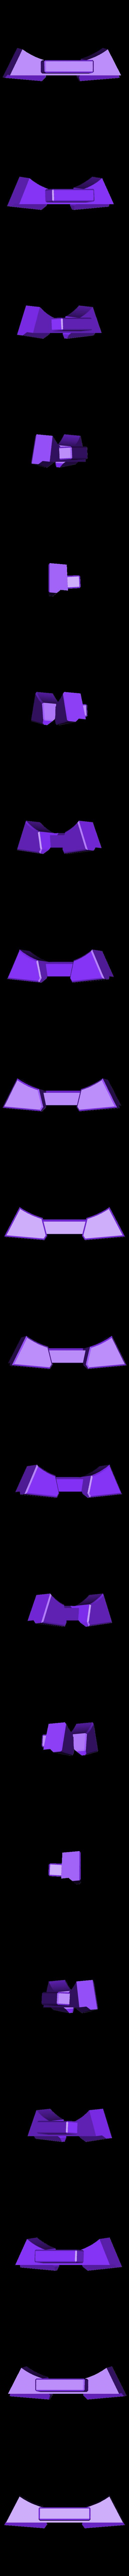 14_Drag_Body3_Main3_GREEN.stl Download STL file ARTICULATED DRAGONLORD (not Dragonzord) - NO SUPPORT • 3D printer model, Toymakr3D